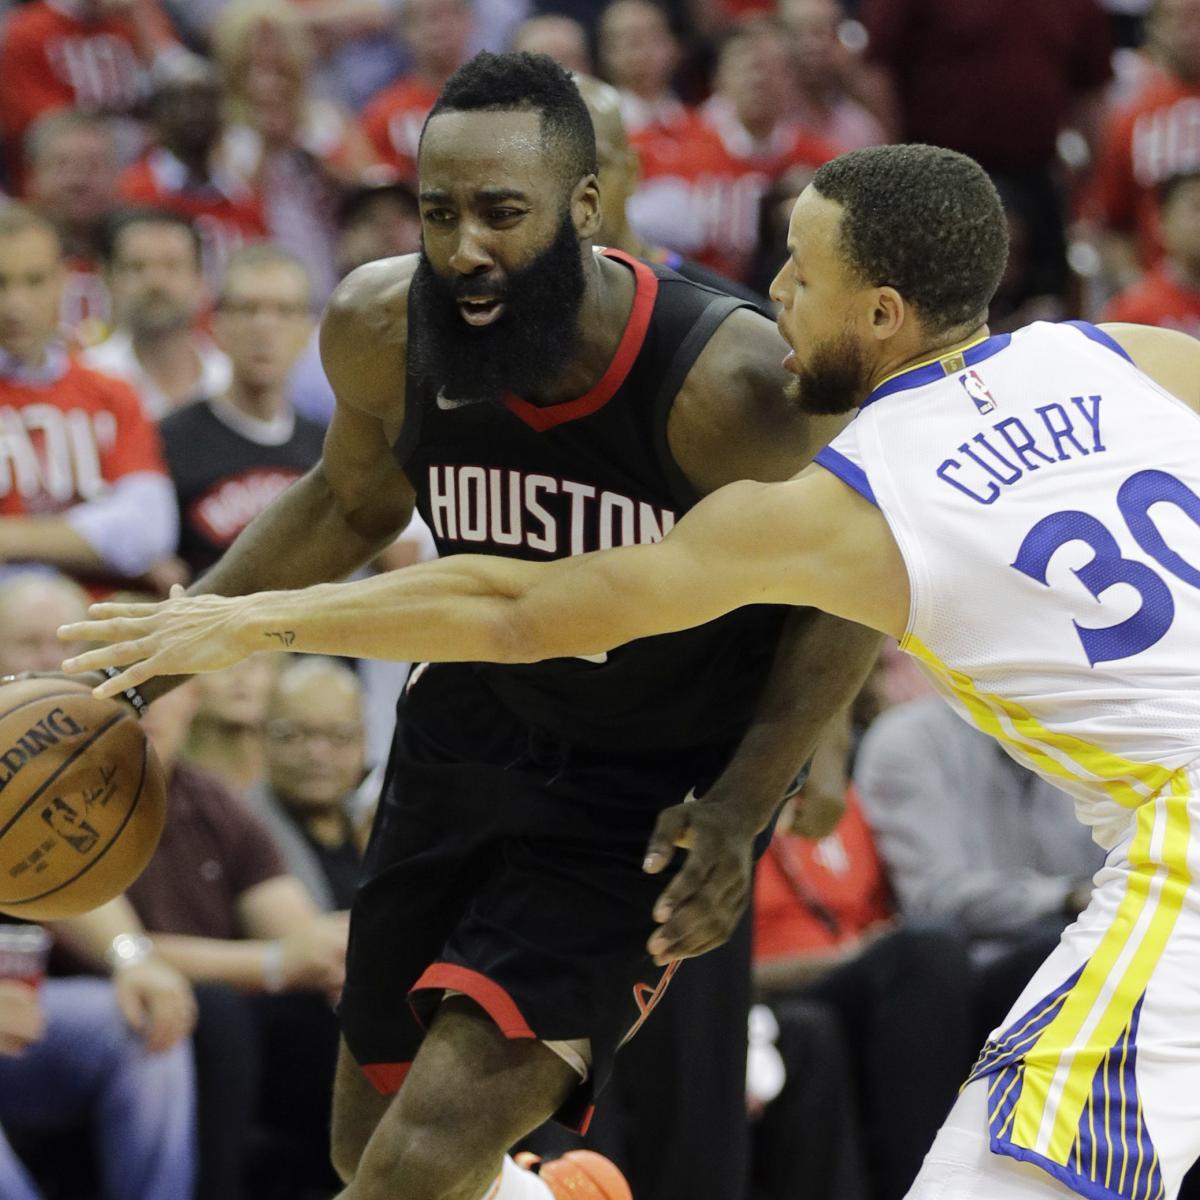 Golden State Warriors Vs Houston Rockets Live Stream 2018: Golden State Warriors Vs. Houston Rockets Game 2 Odds, NBA